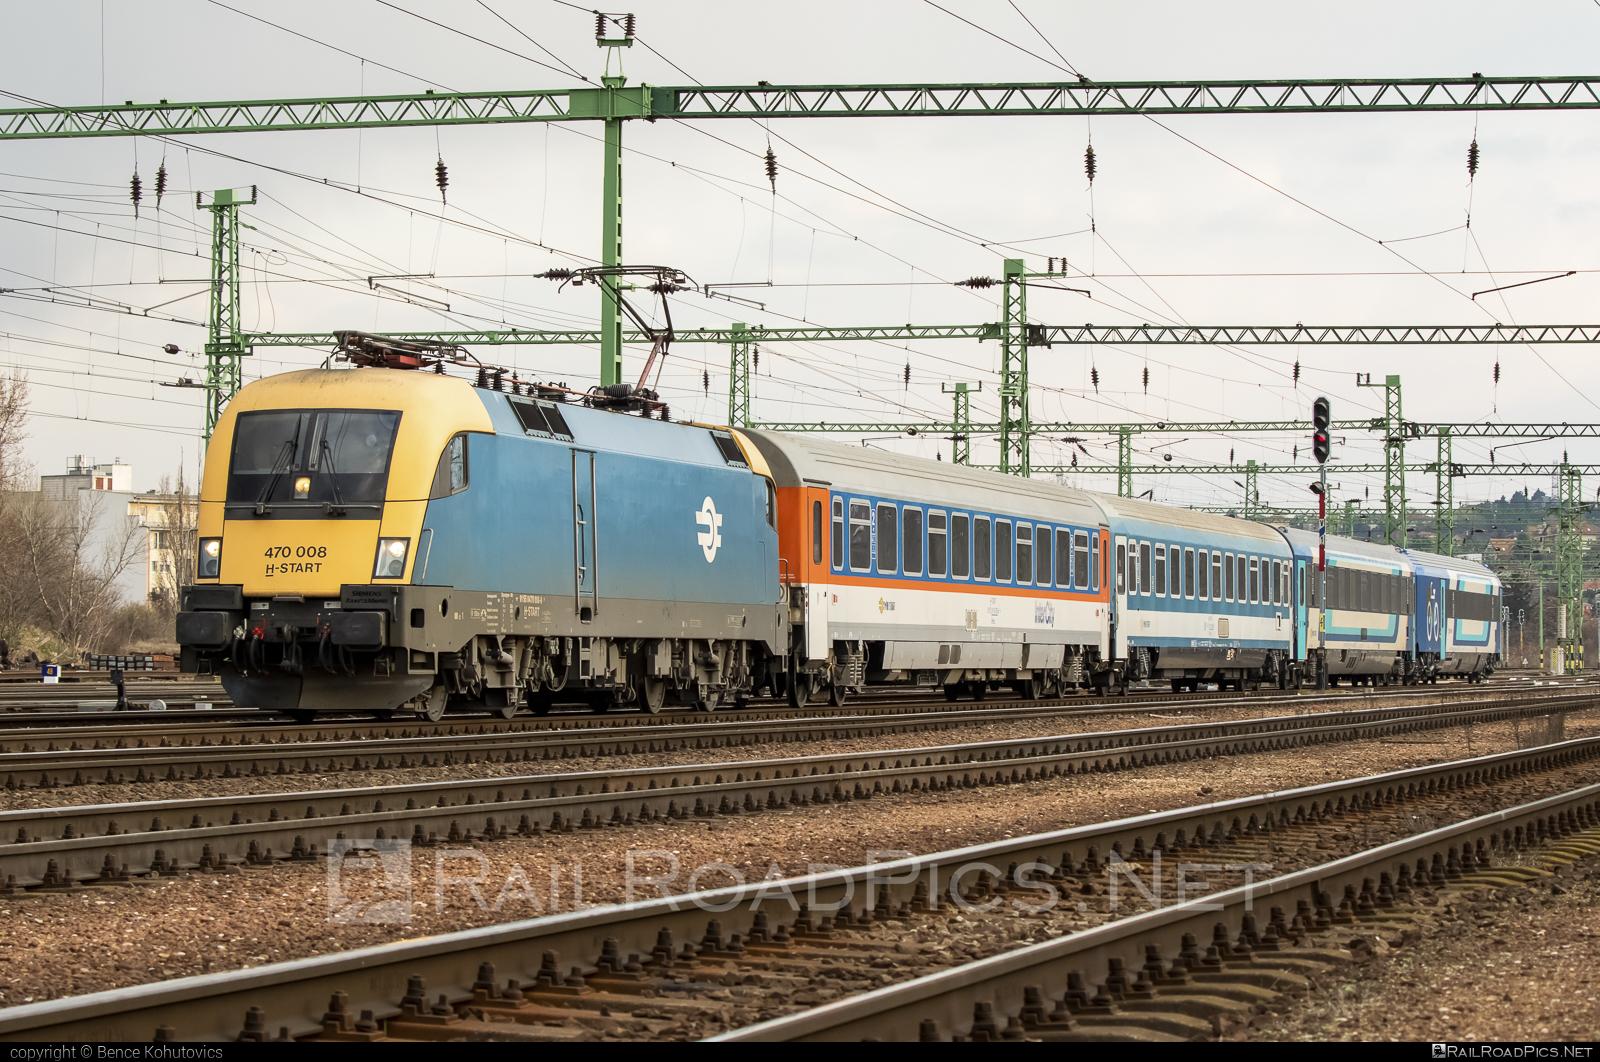 Siemens ES 64 U2 - 470 008 operated by MÁV-START ZRt. #es64 #es64u #es64u2 #eurosprinter #mav #mavstart #mavstartzrt #siemens #siemenses64 #siemenses64u #siemenses64u2 #siemenstaurus #taurus #tauruslocomotive